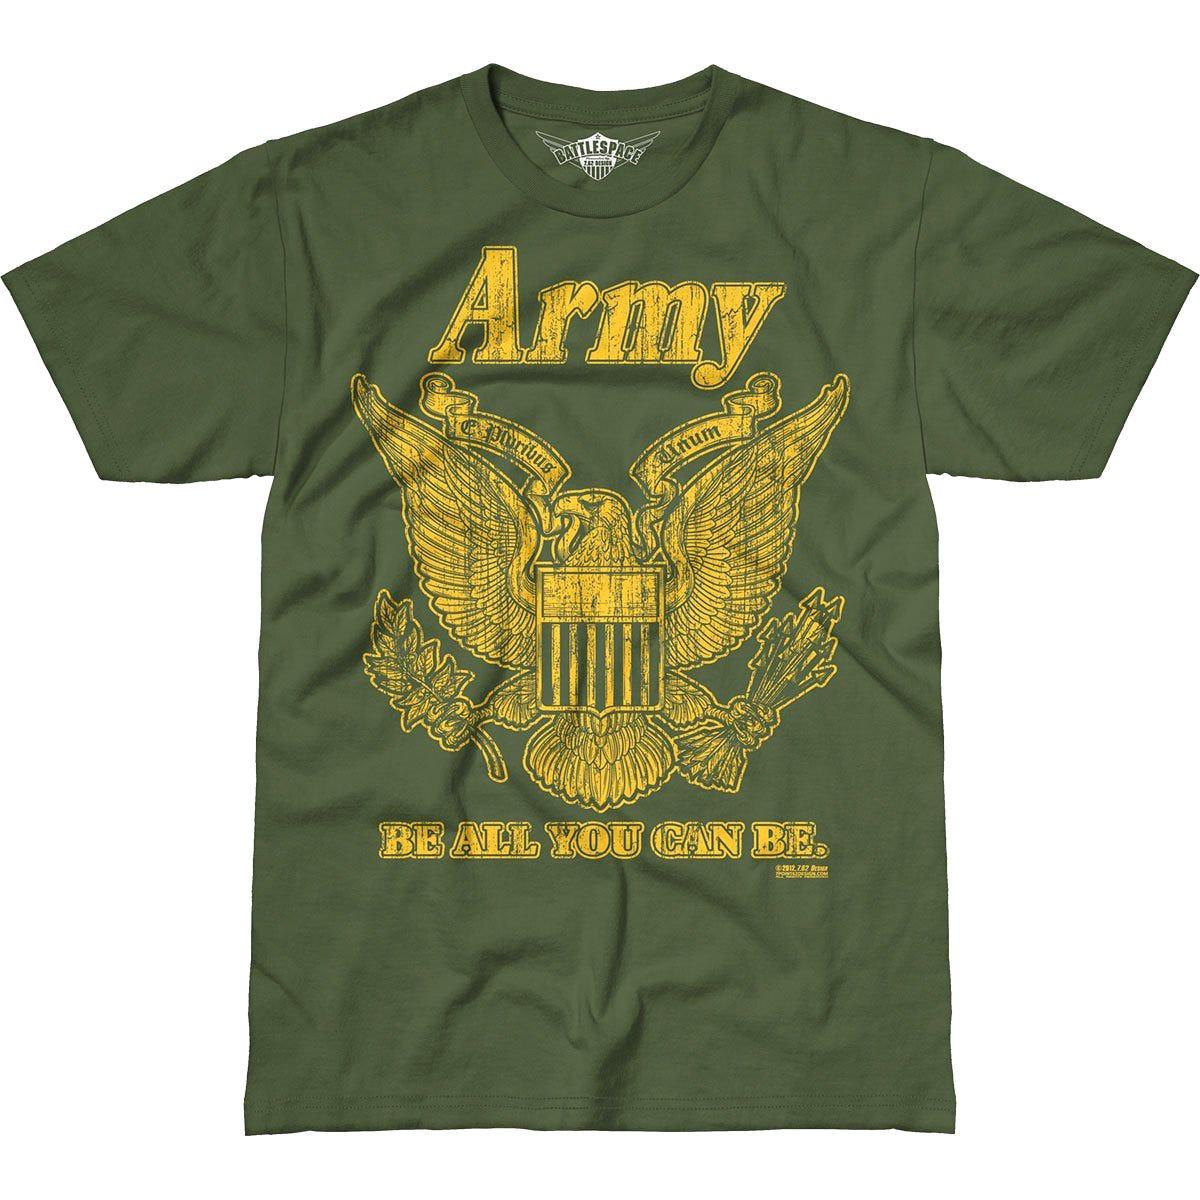 762 Design Army Retro Battlespace T Shirt Military Green